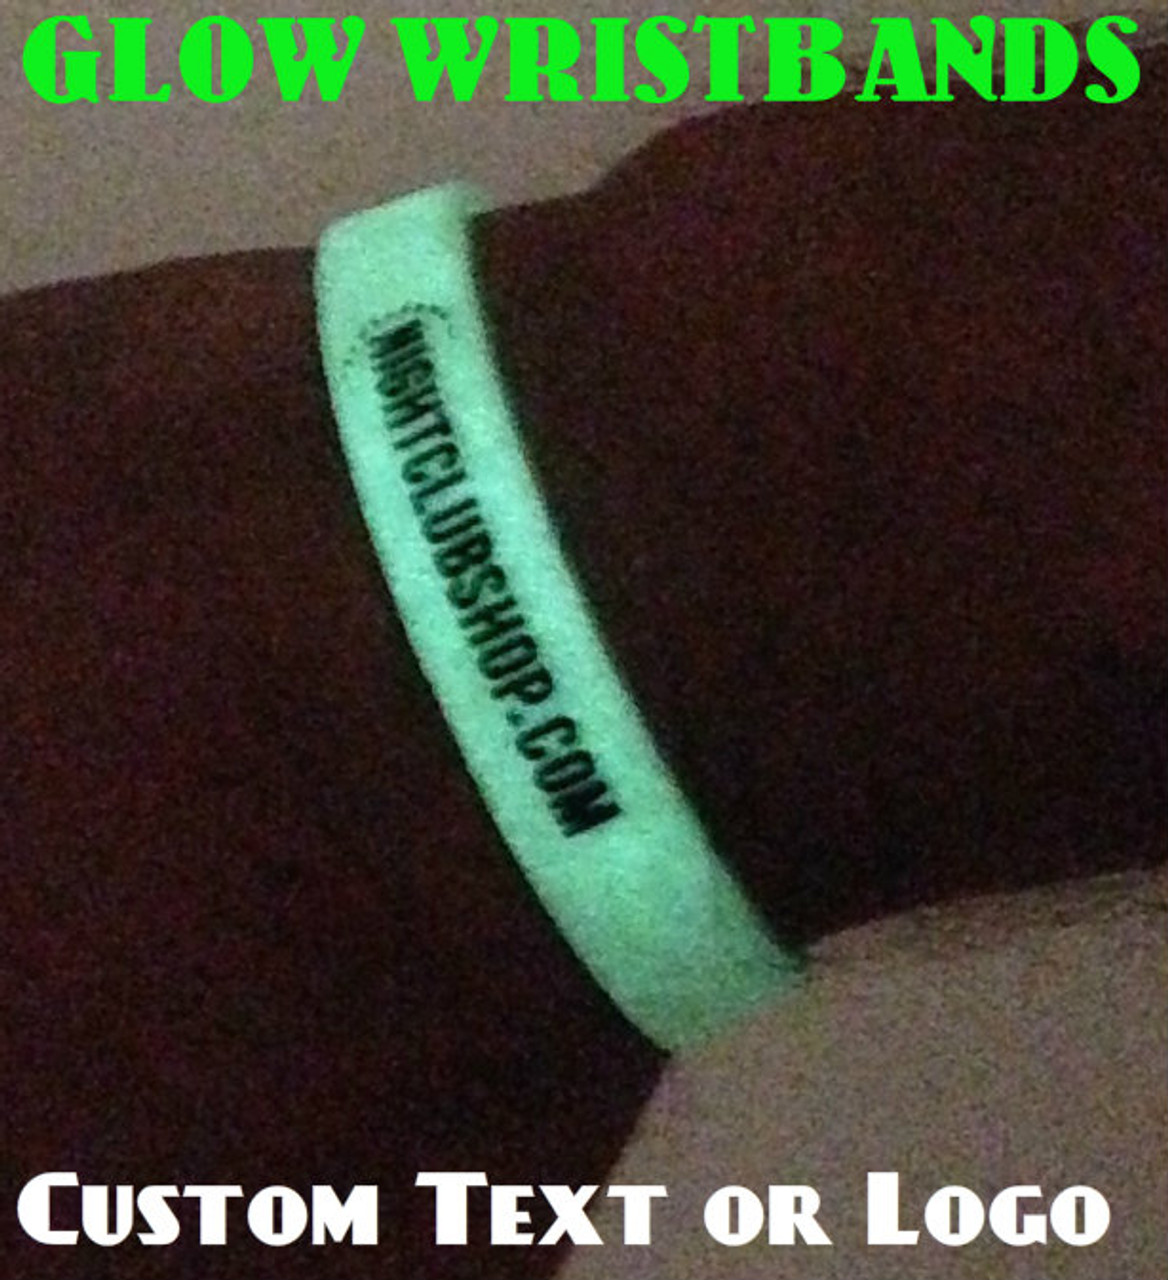 Glow,Wristbands, Text, or, Logo, Custom